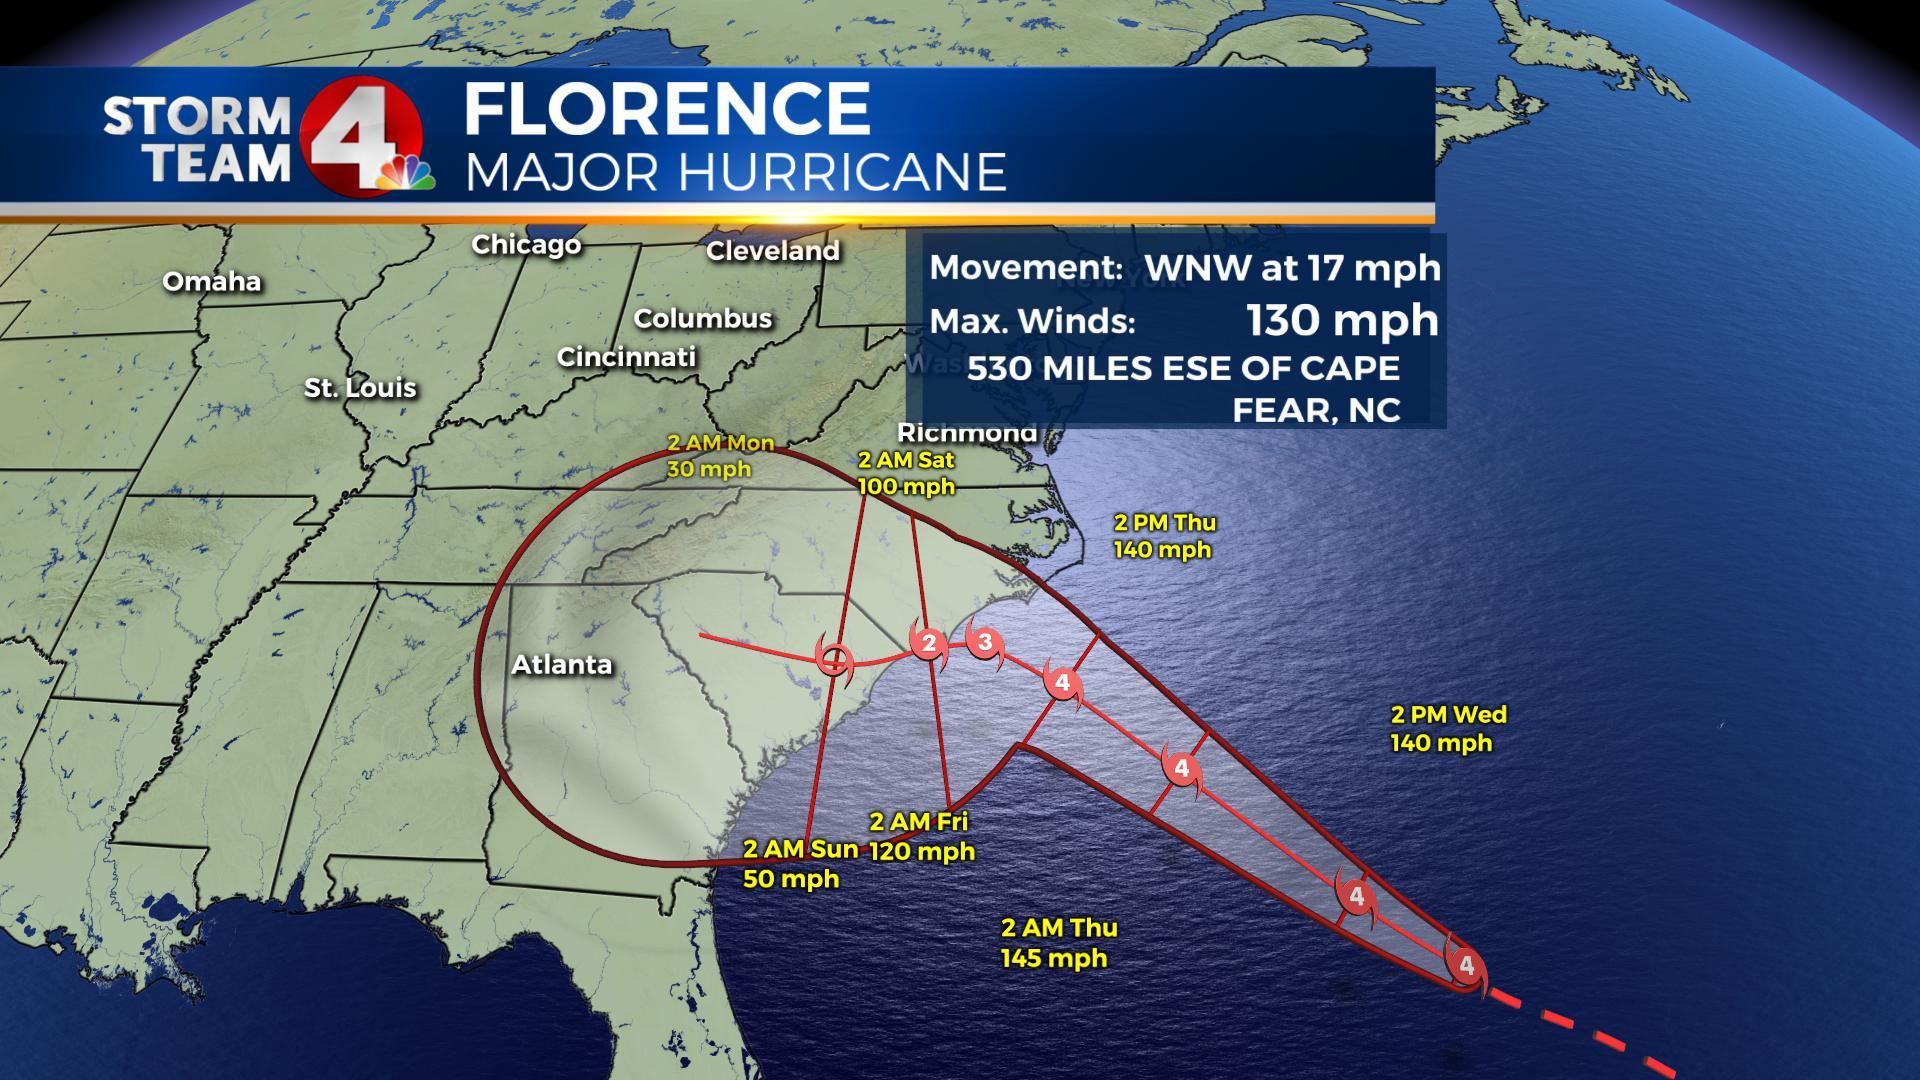 Major Hurricane Florence Update - Monday Evening